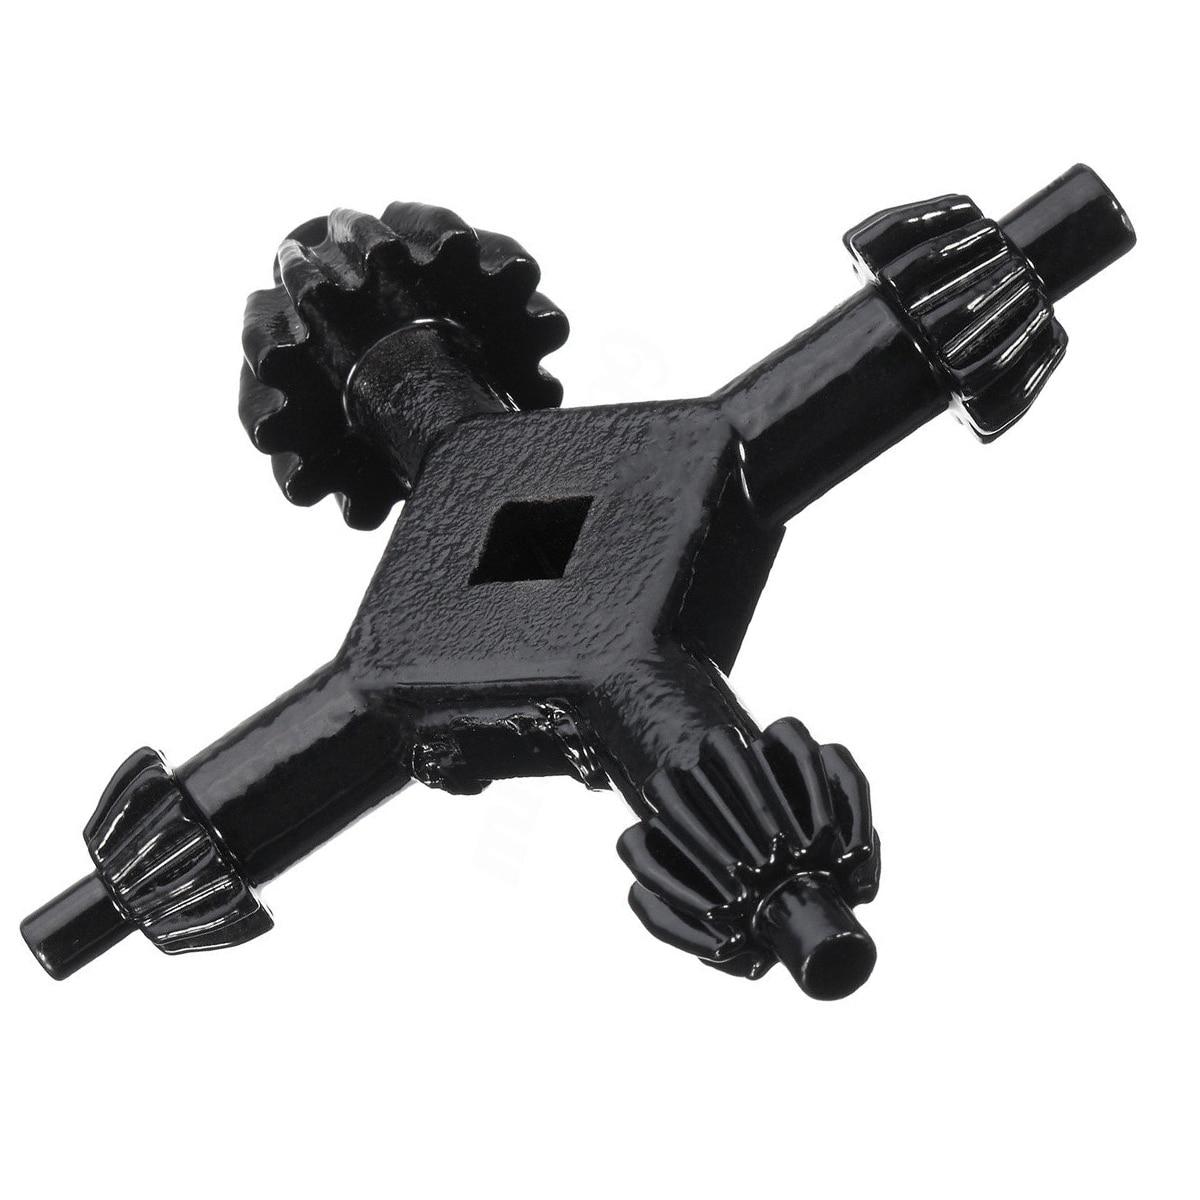 4 Way Drill Press Chuck Key Carbon Steel Combination 1/2